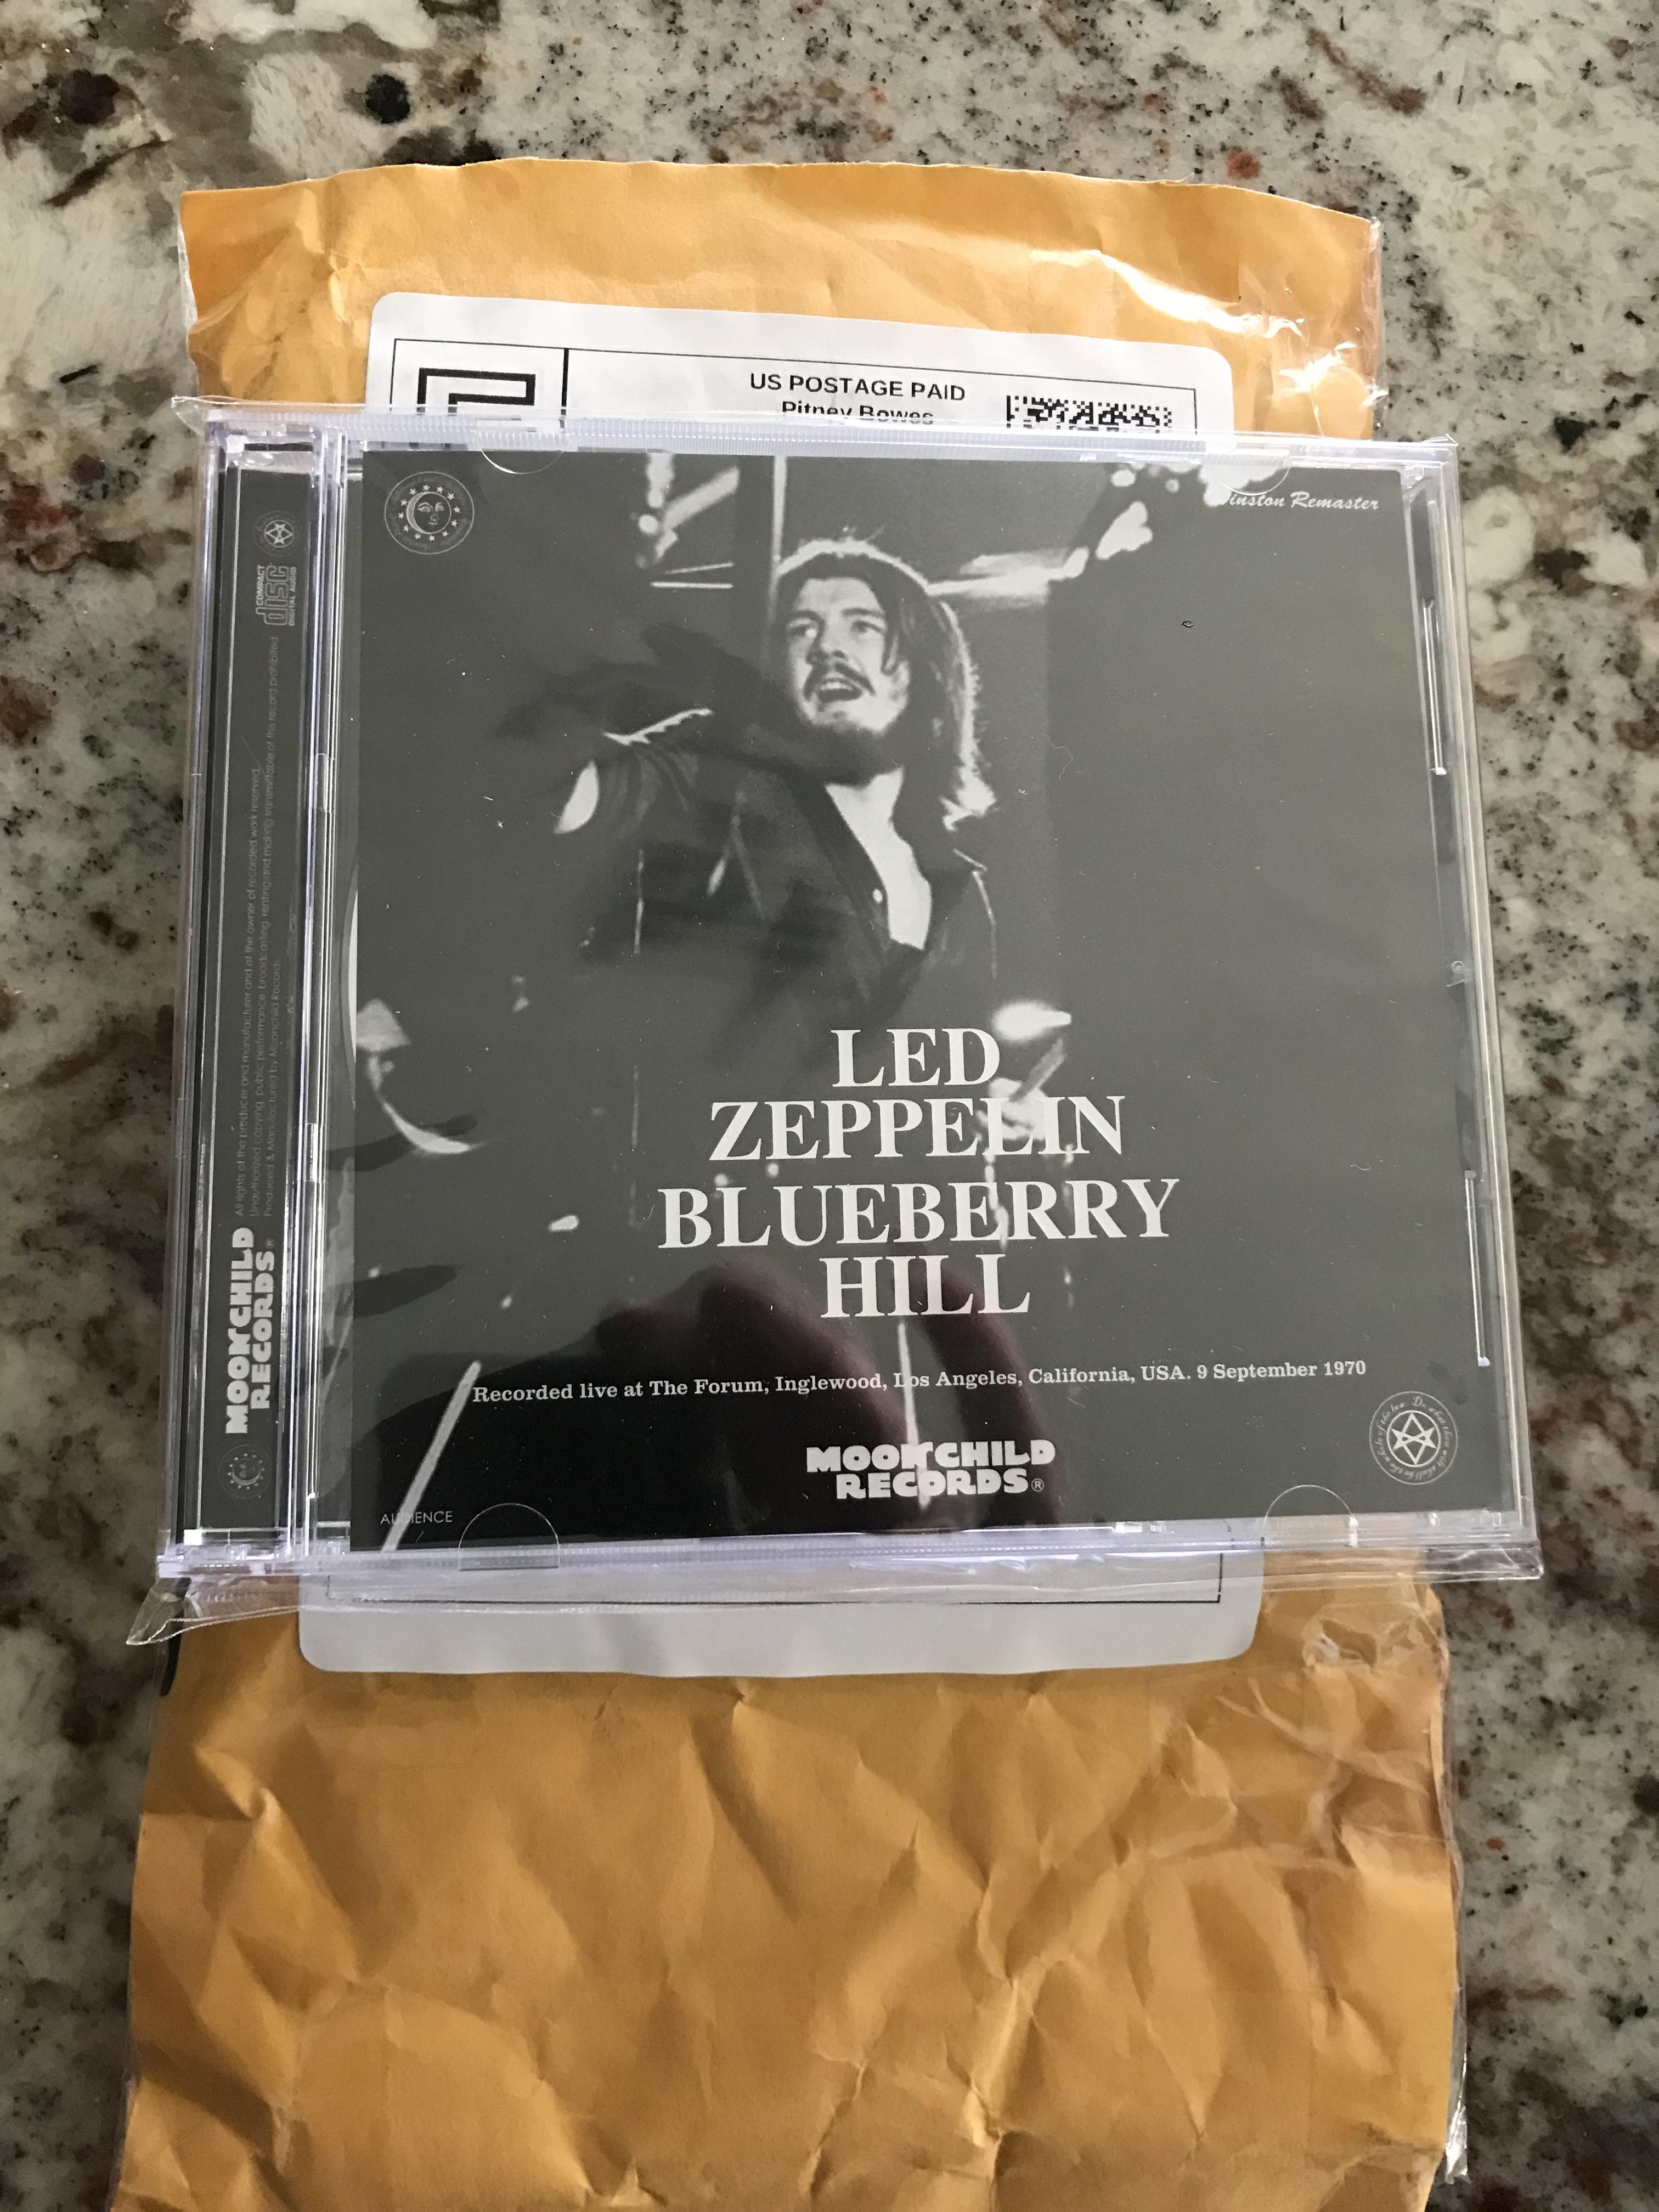 Definitive Blueberry Hill - Page 3 - Led Zep Live - Led